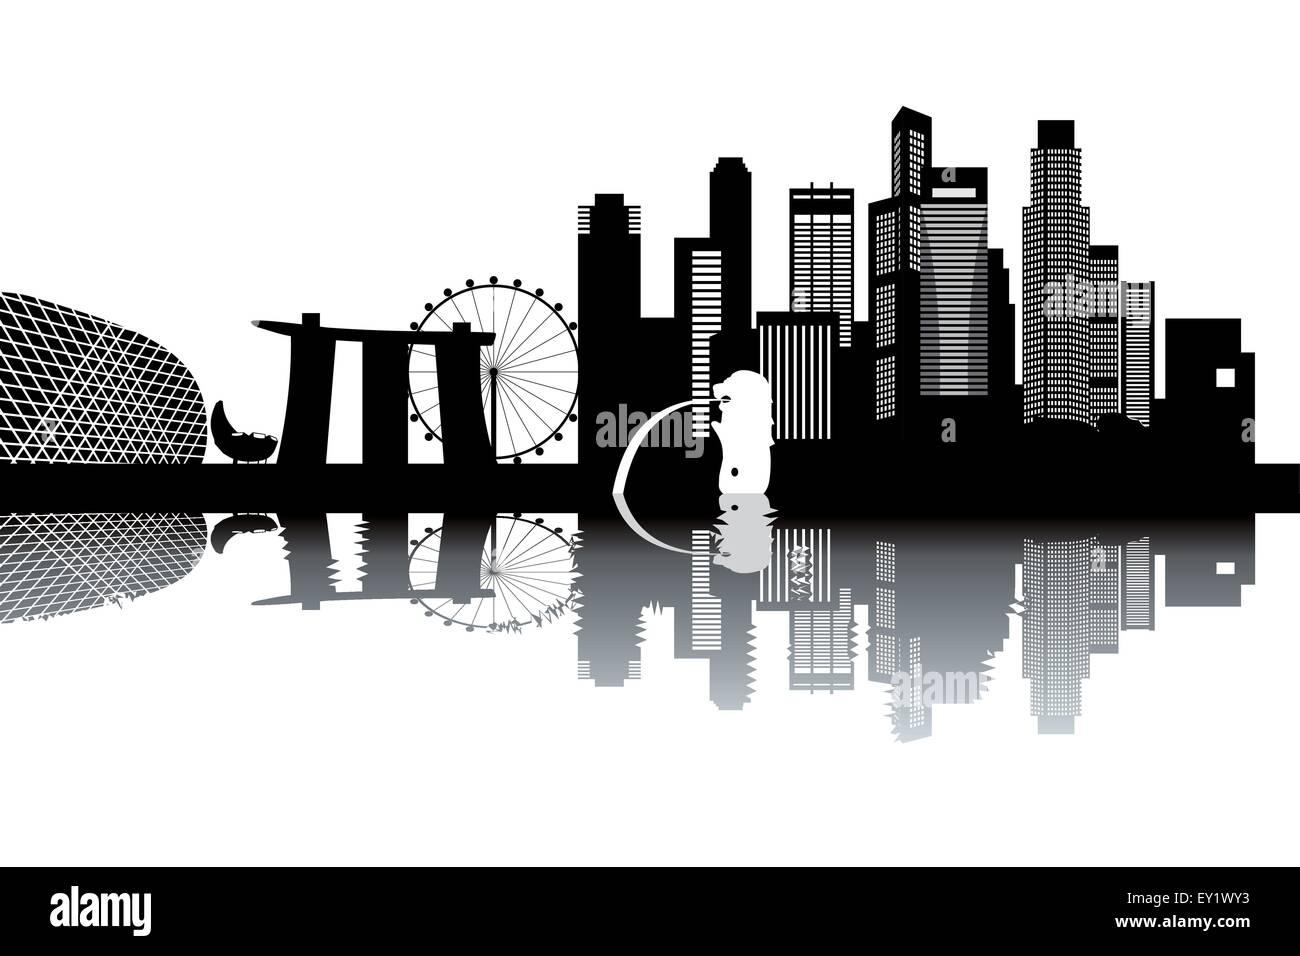 Singapore Skyline Black And White Vector Illustration